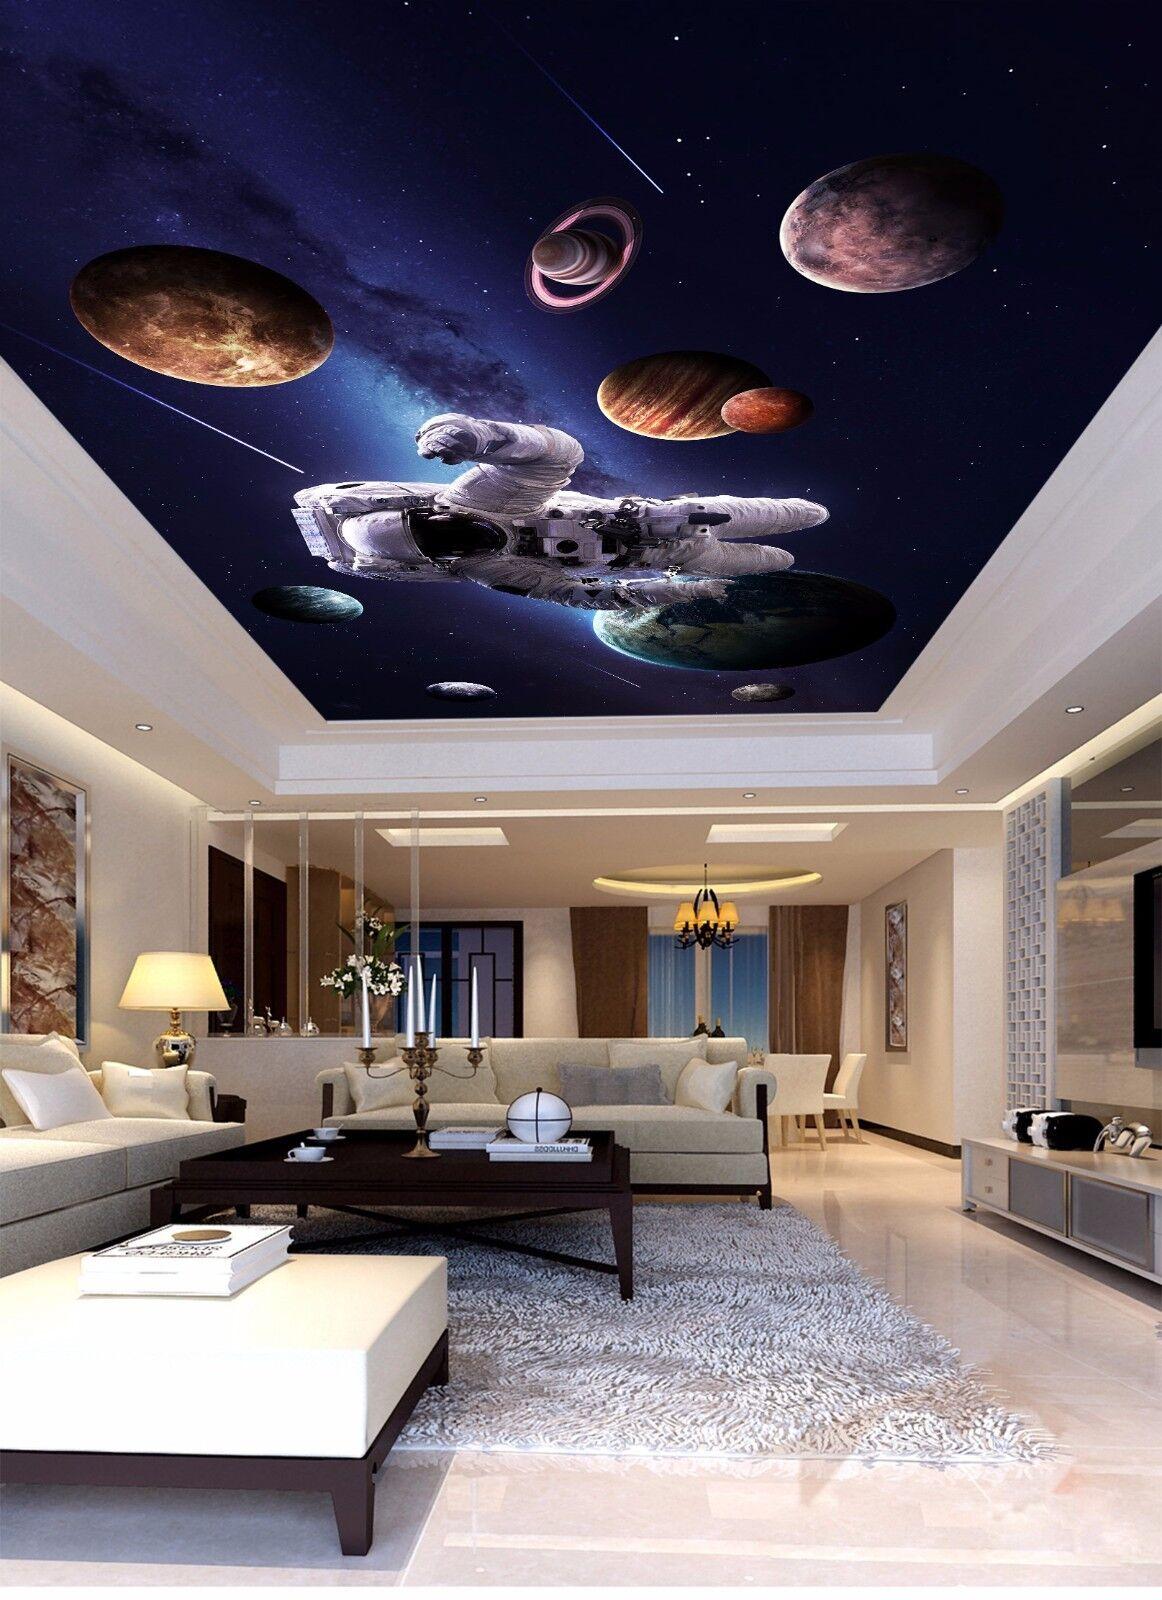 3D Astronaut Earth 7 Ceiling WallPaper Murals Wall Print Decal Deco AJ WALLPAPER